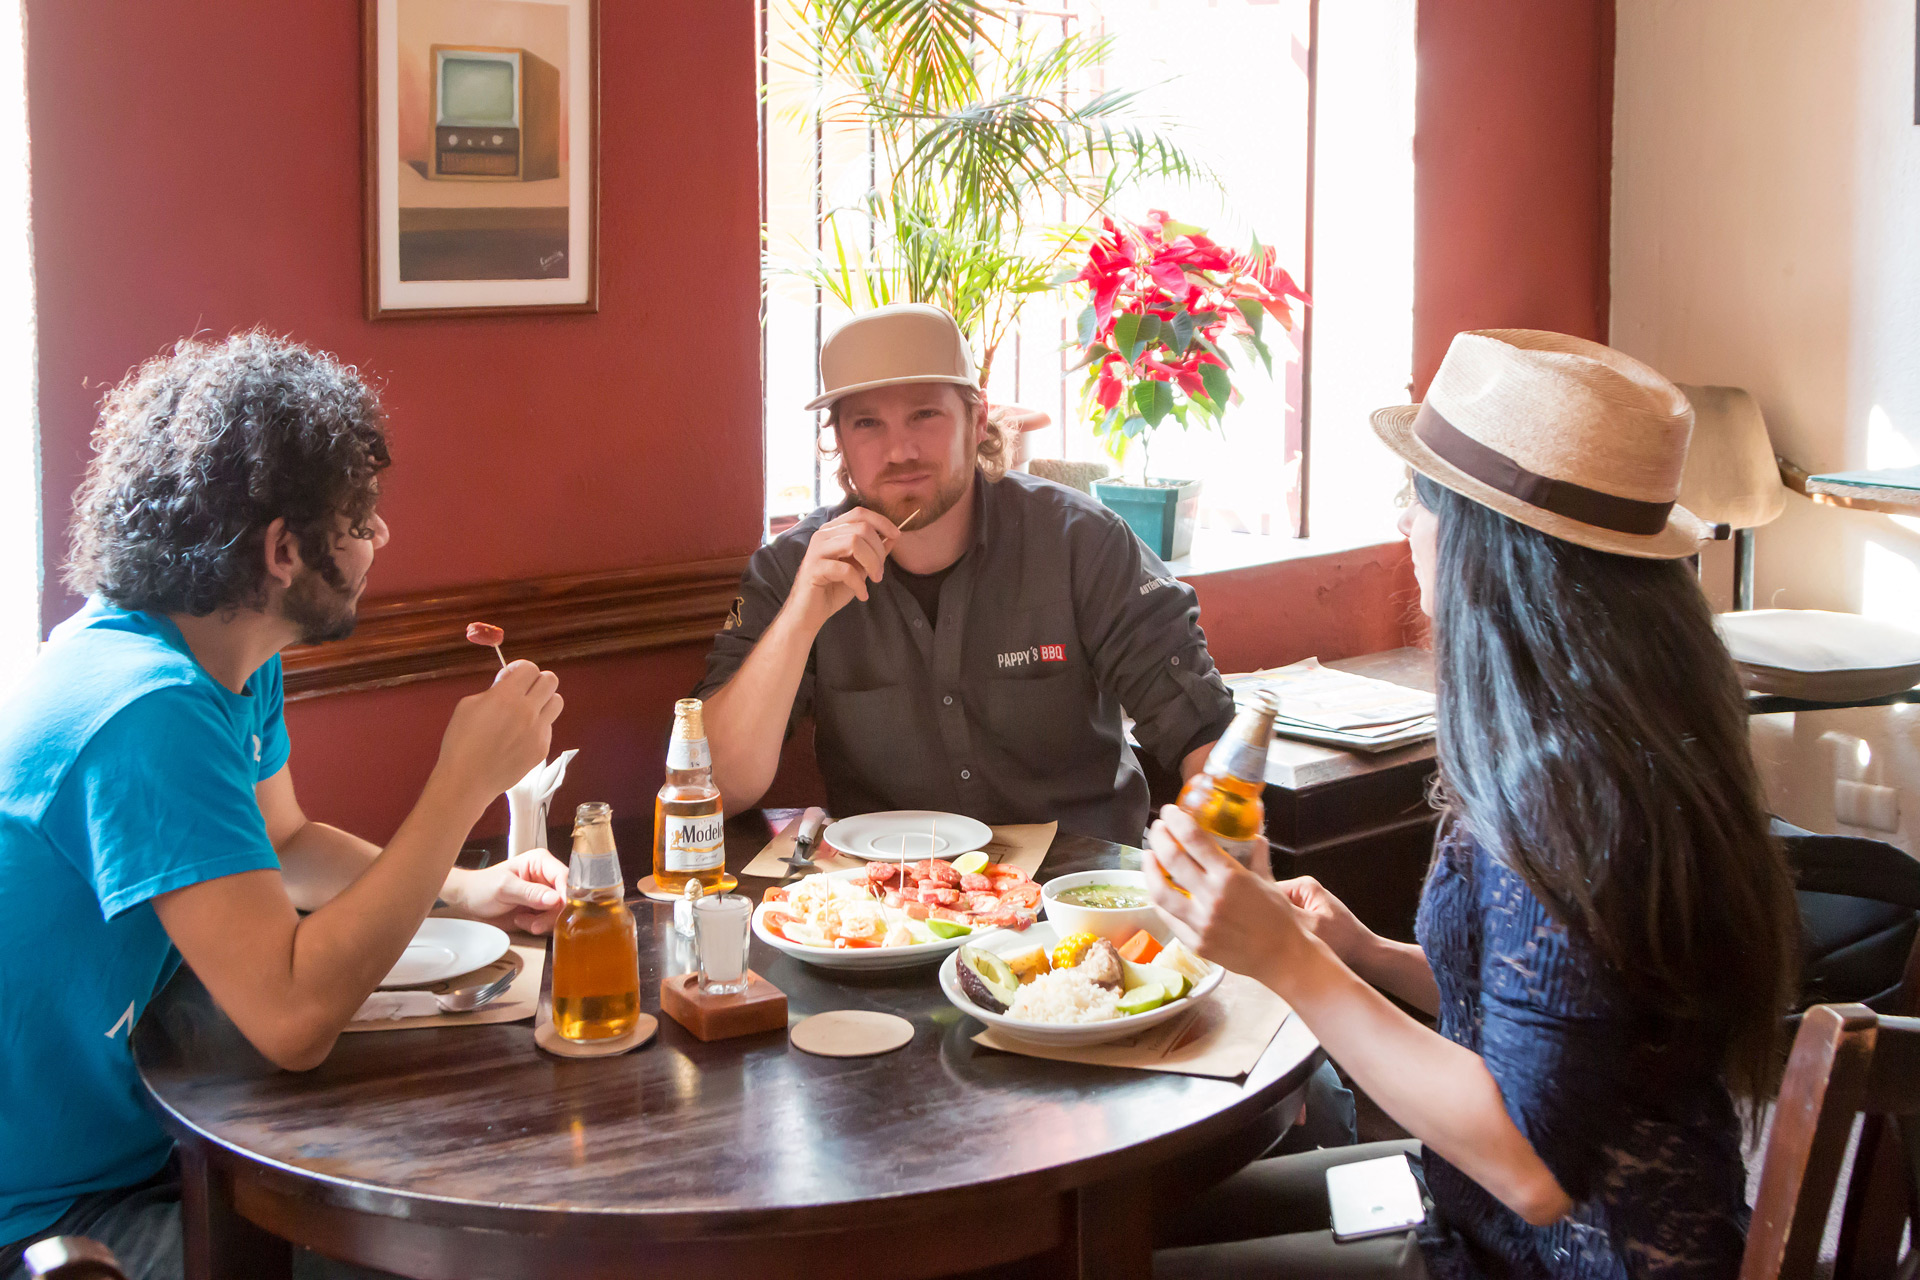 restaurante-el-che-cha-cerveza-modelo-walking-foodie-tour-pablo-bromo-lucia-blake-zona-uno-1-portada